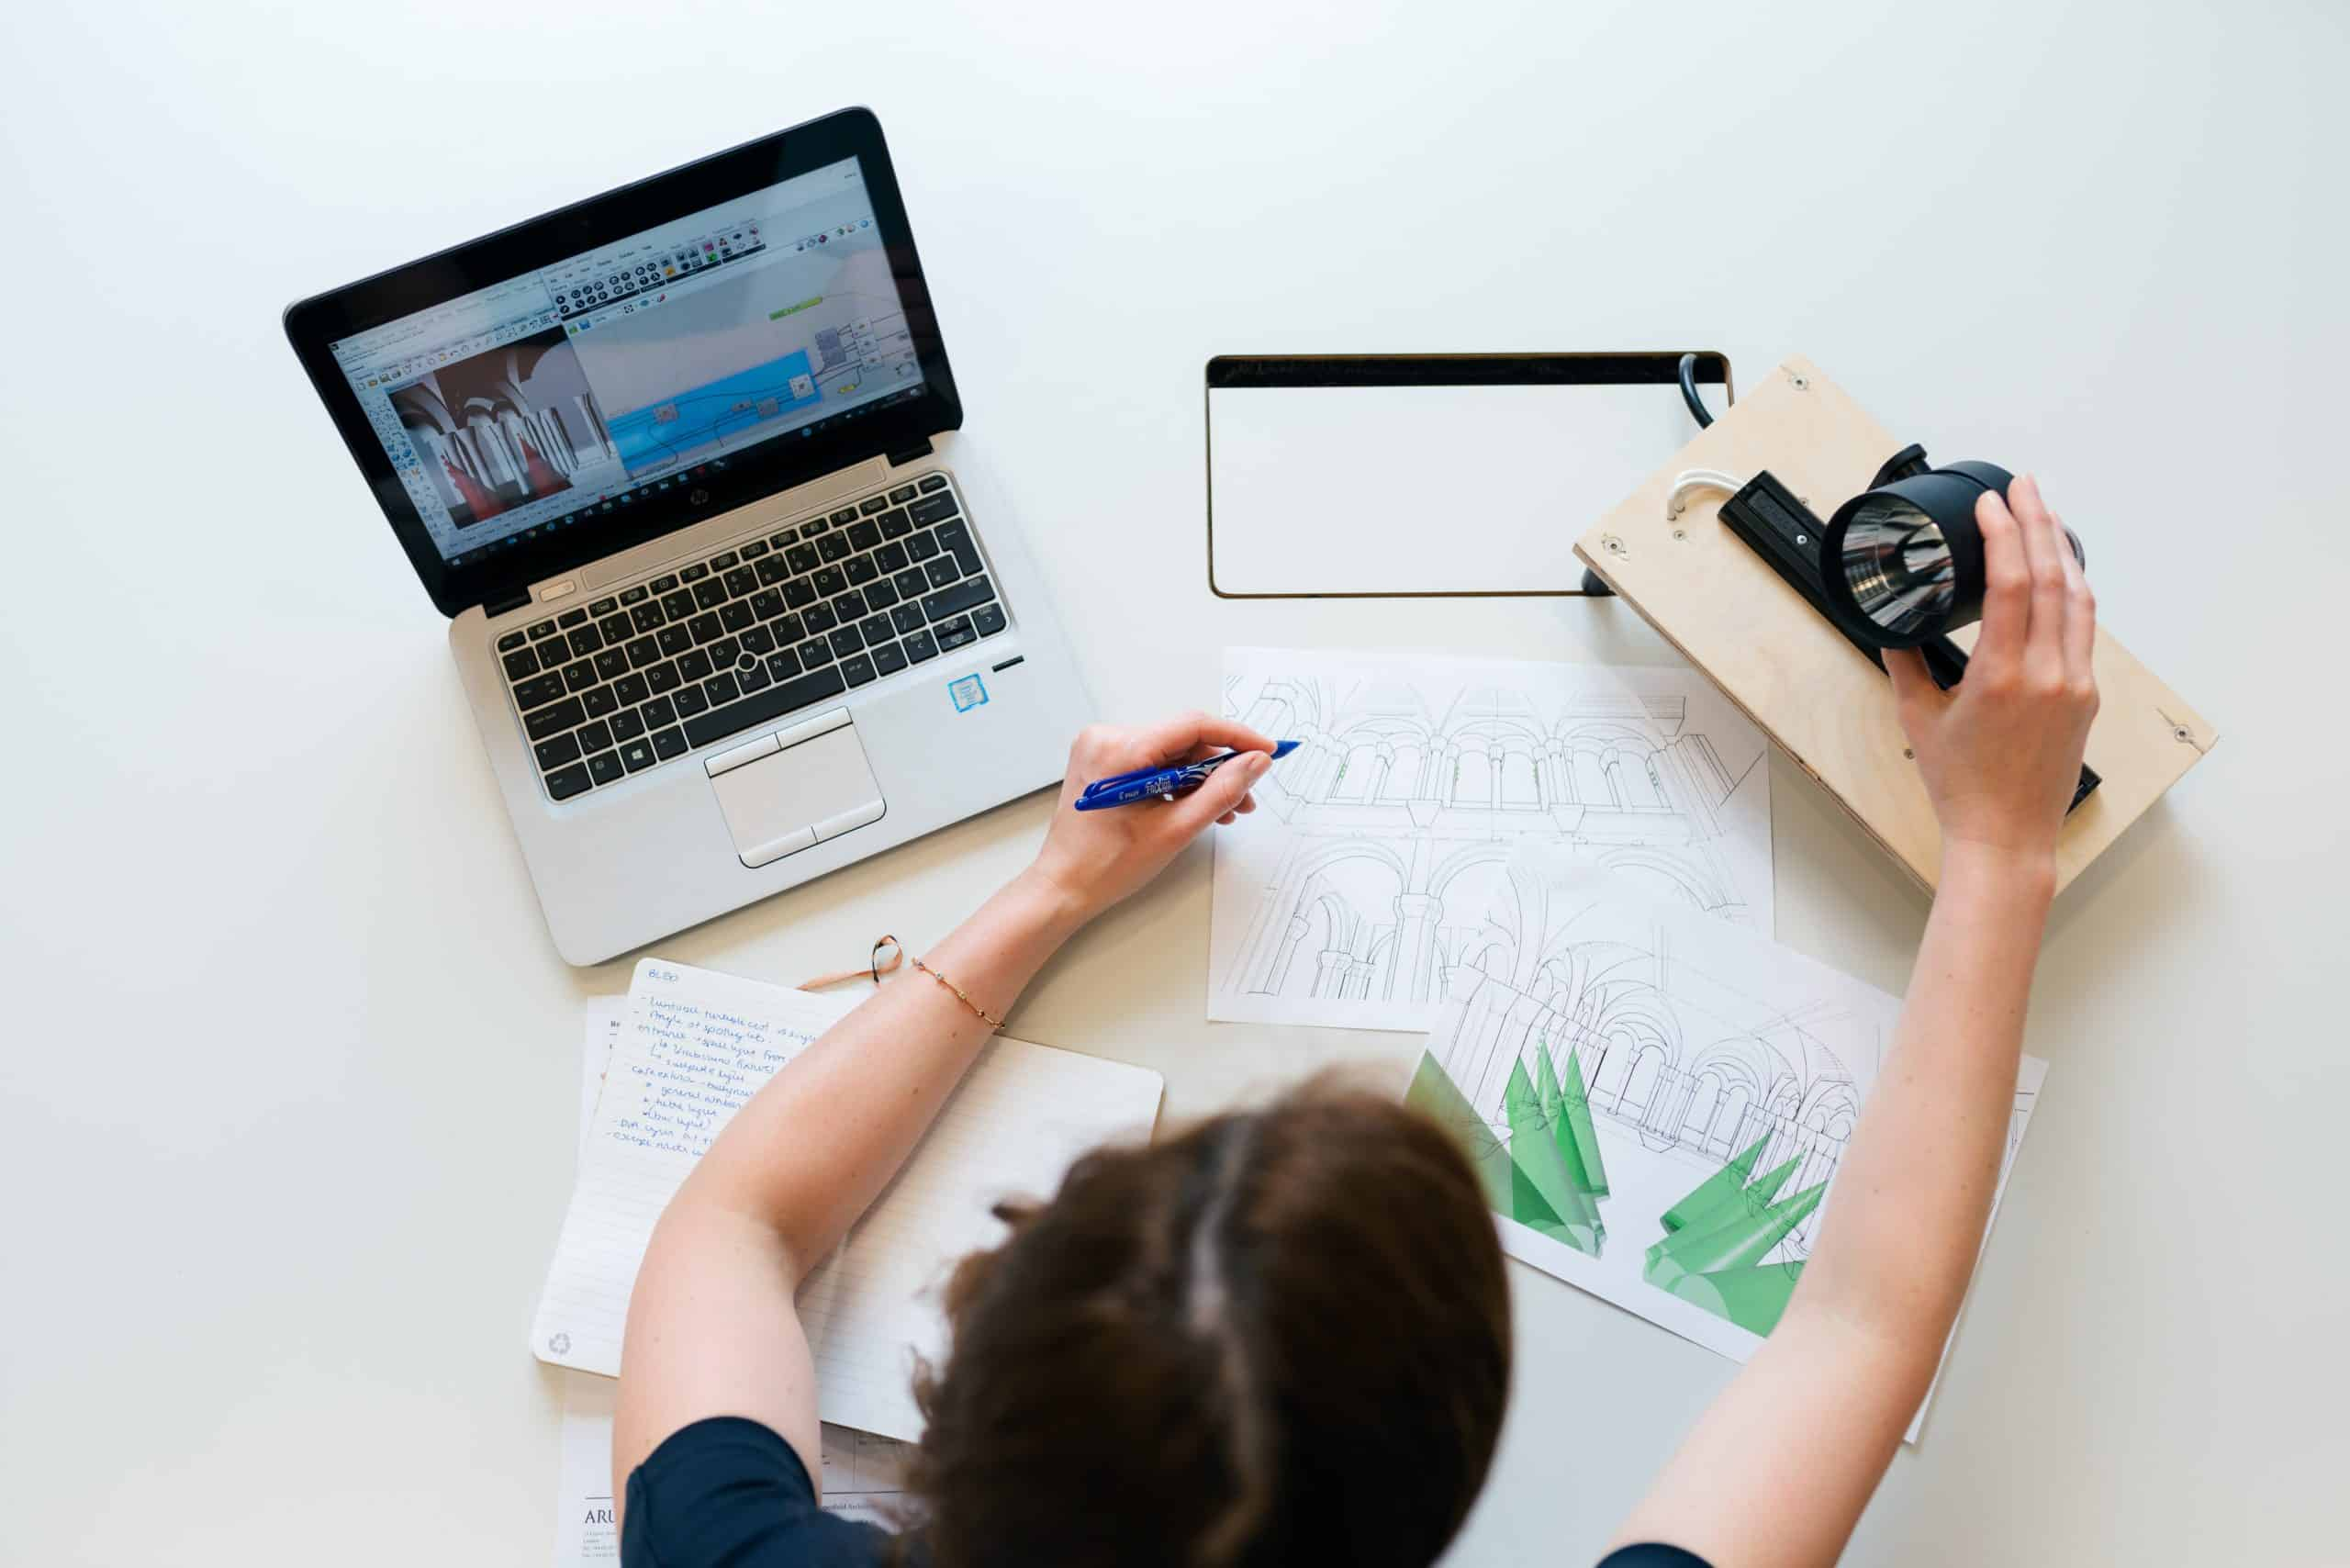 Best Business Technology Management course tutorial class certification training online